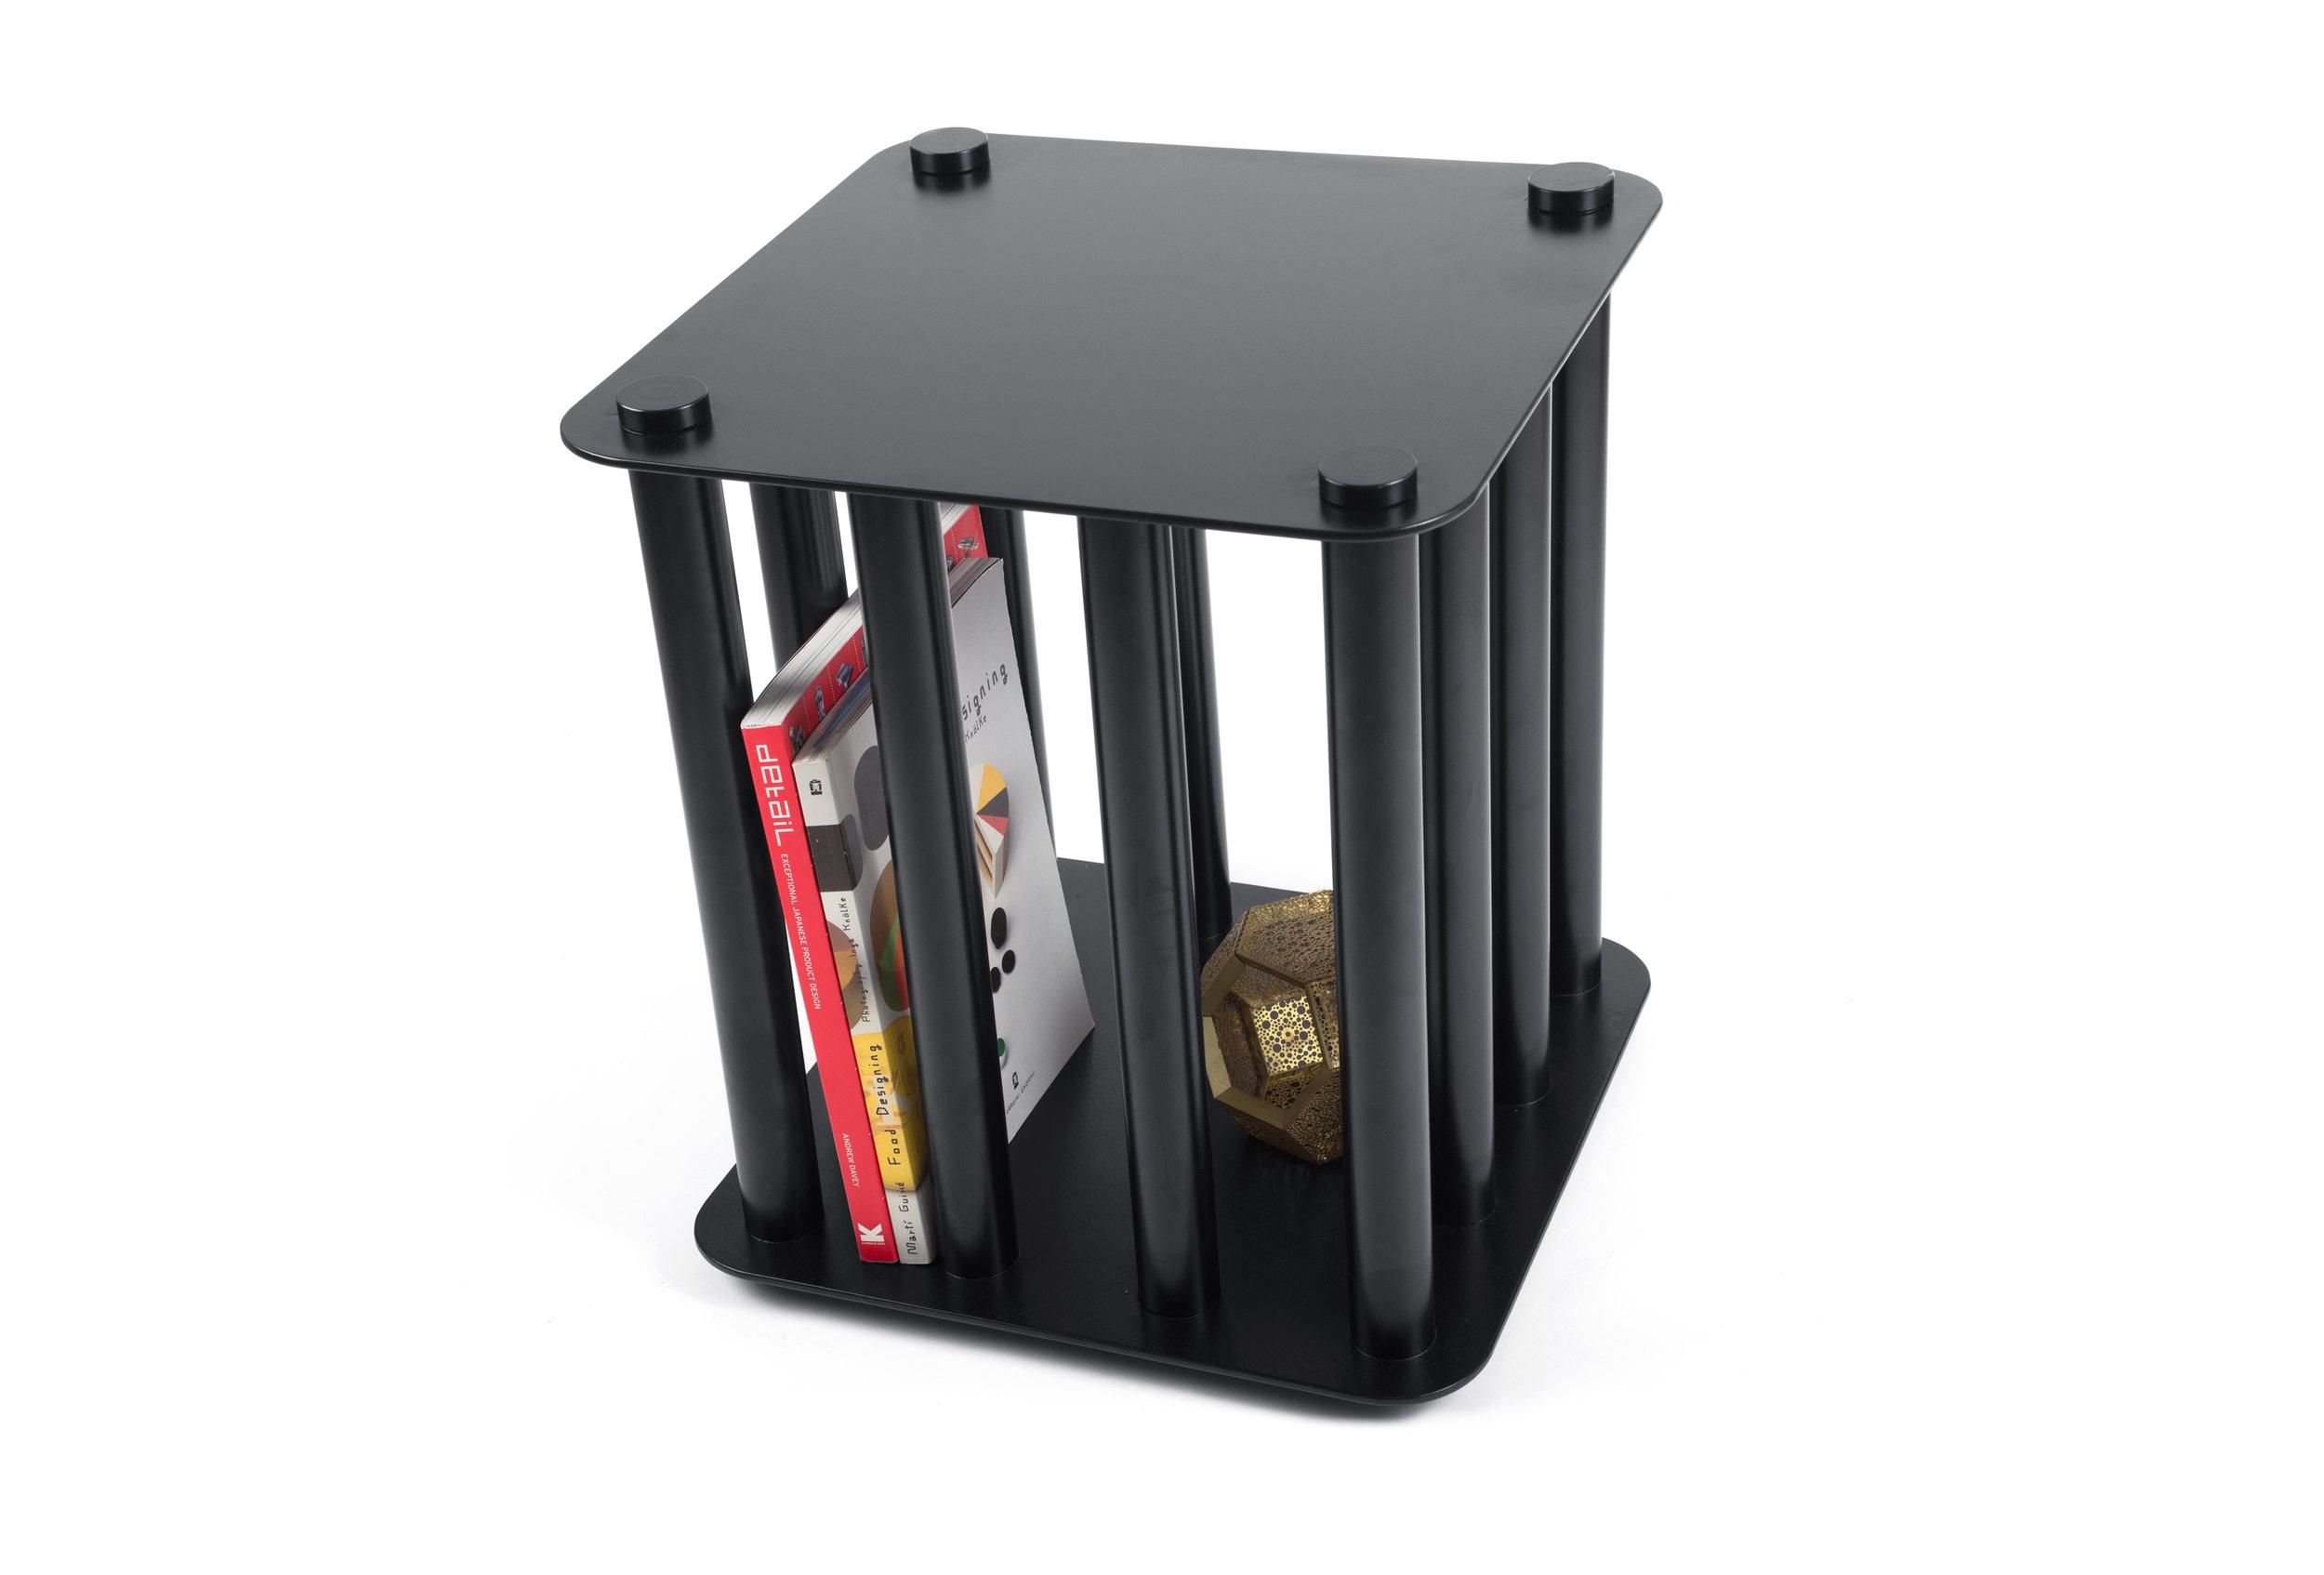 jorge-diego-etienne-cages-10